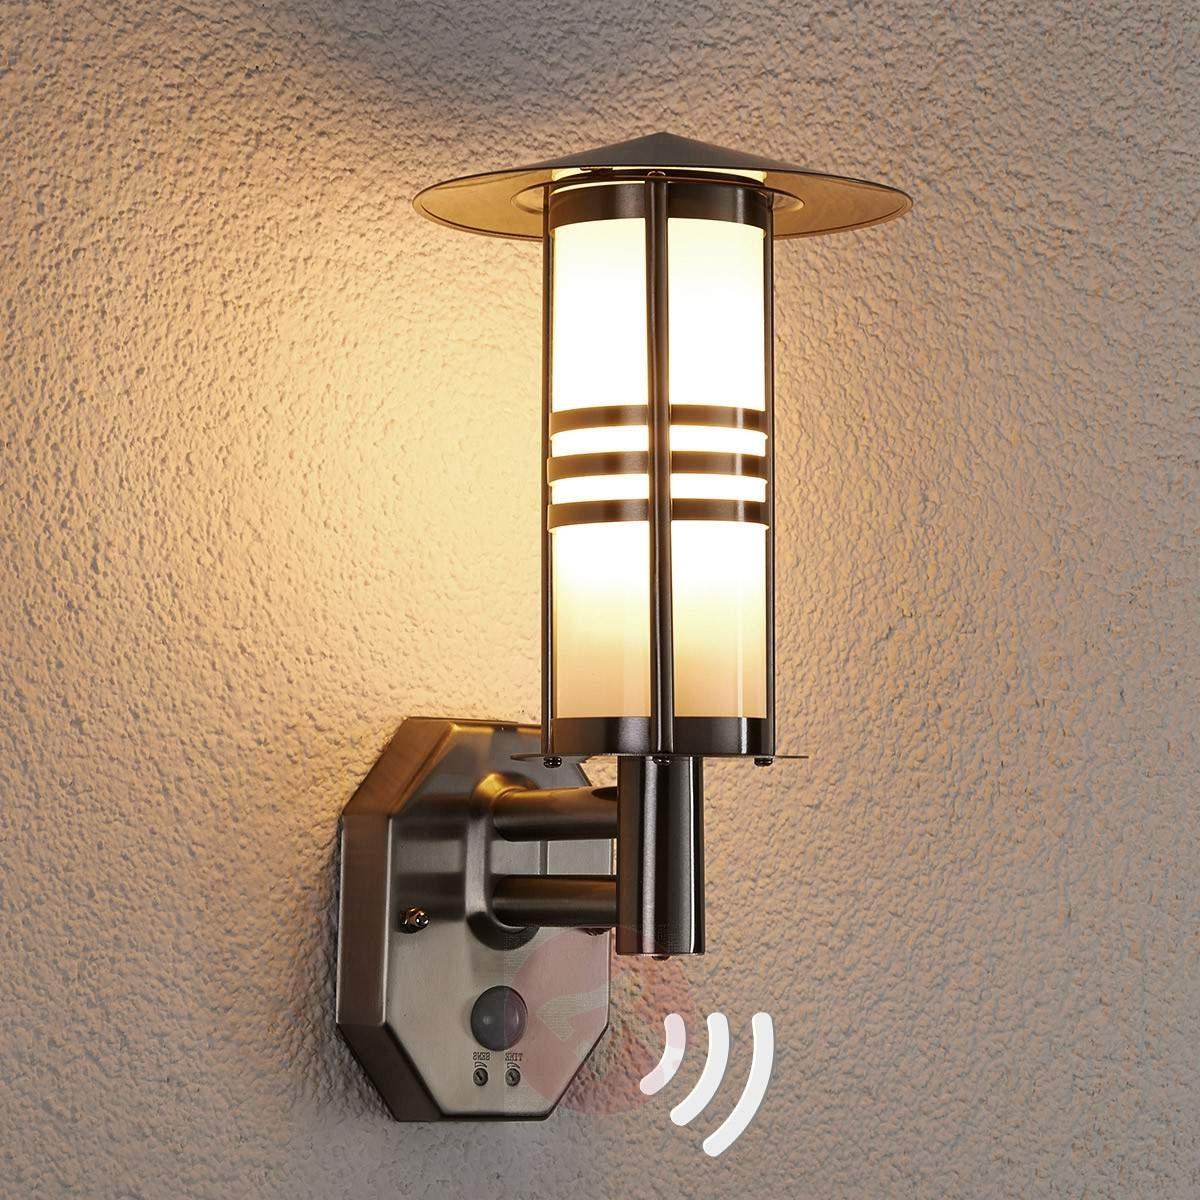 Lights.co.uk For Preferred Pir Sensor Outdoor Wall Lighting (Gallery 19 of 20)